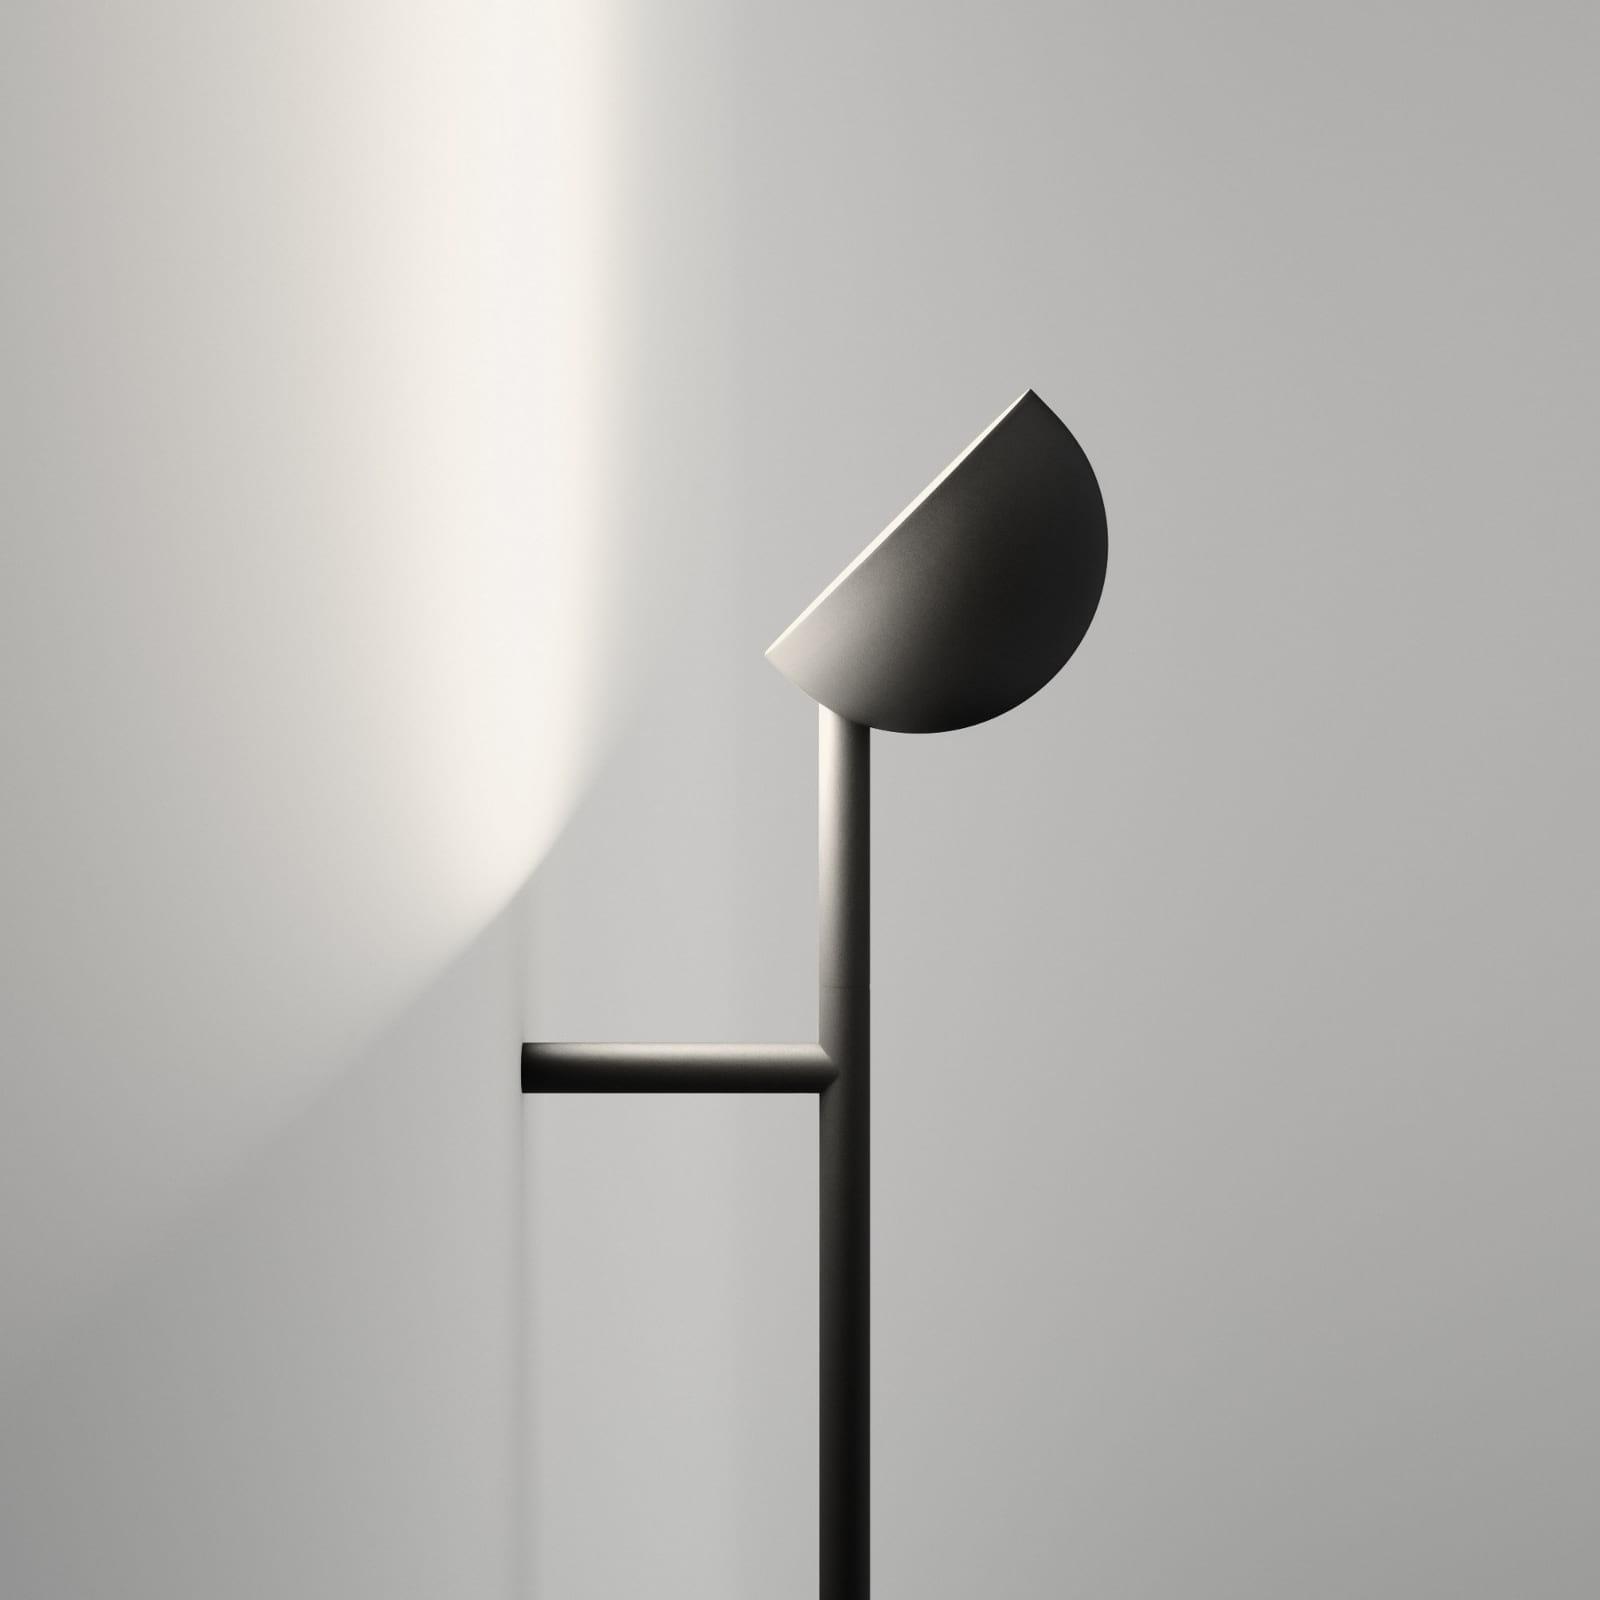 Vibia Pin Wall Light by Ichiro Iwasaki.